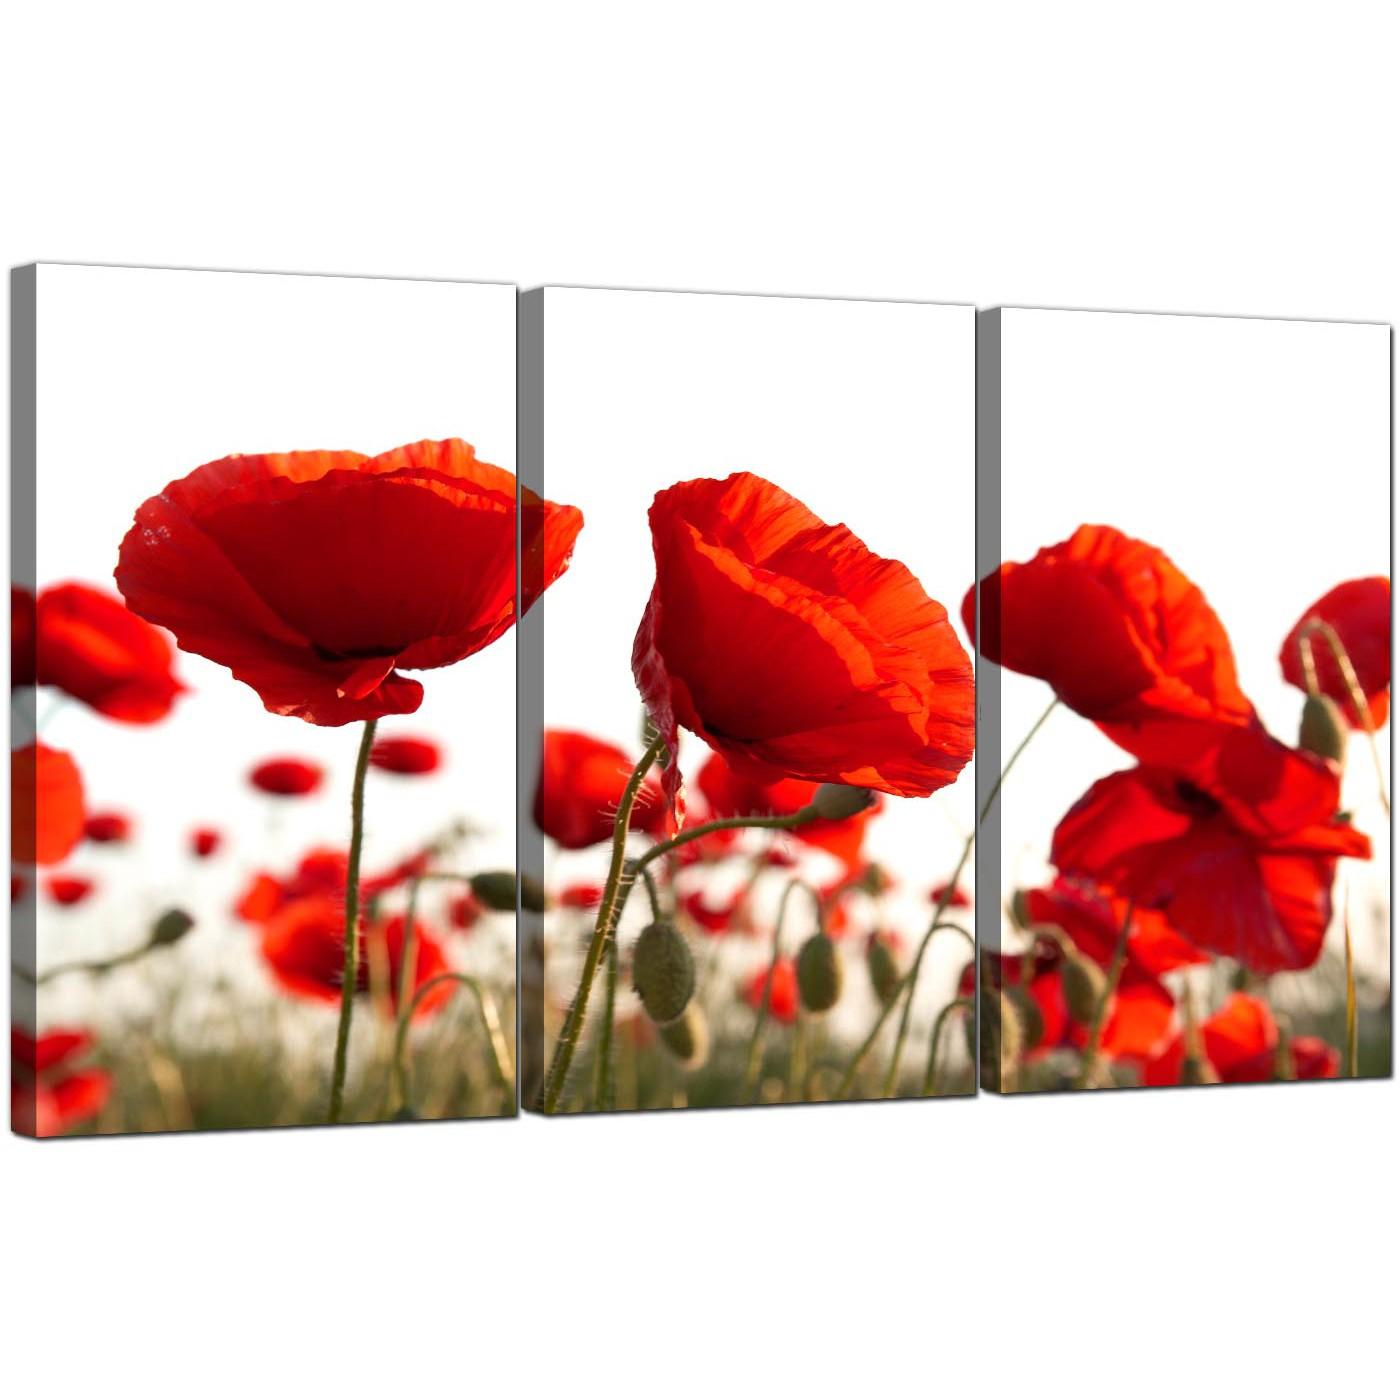 Superior Display Gallery Item 5; Set Of 3 Flowers Canvas Wall Art Poppy 3056 Display  Gallery Item 6